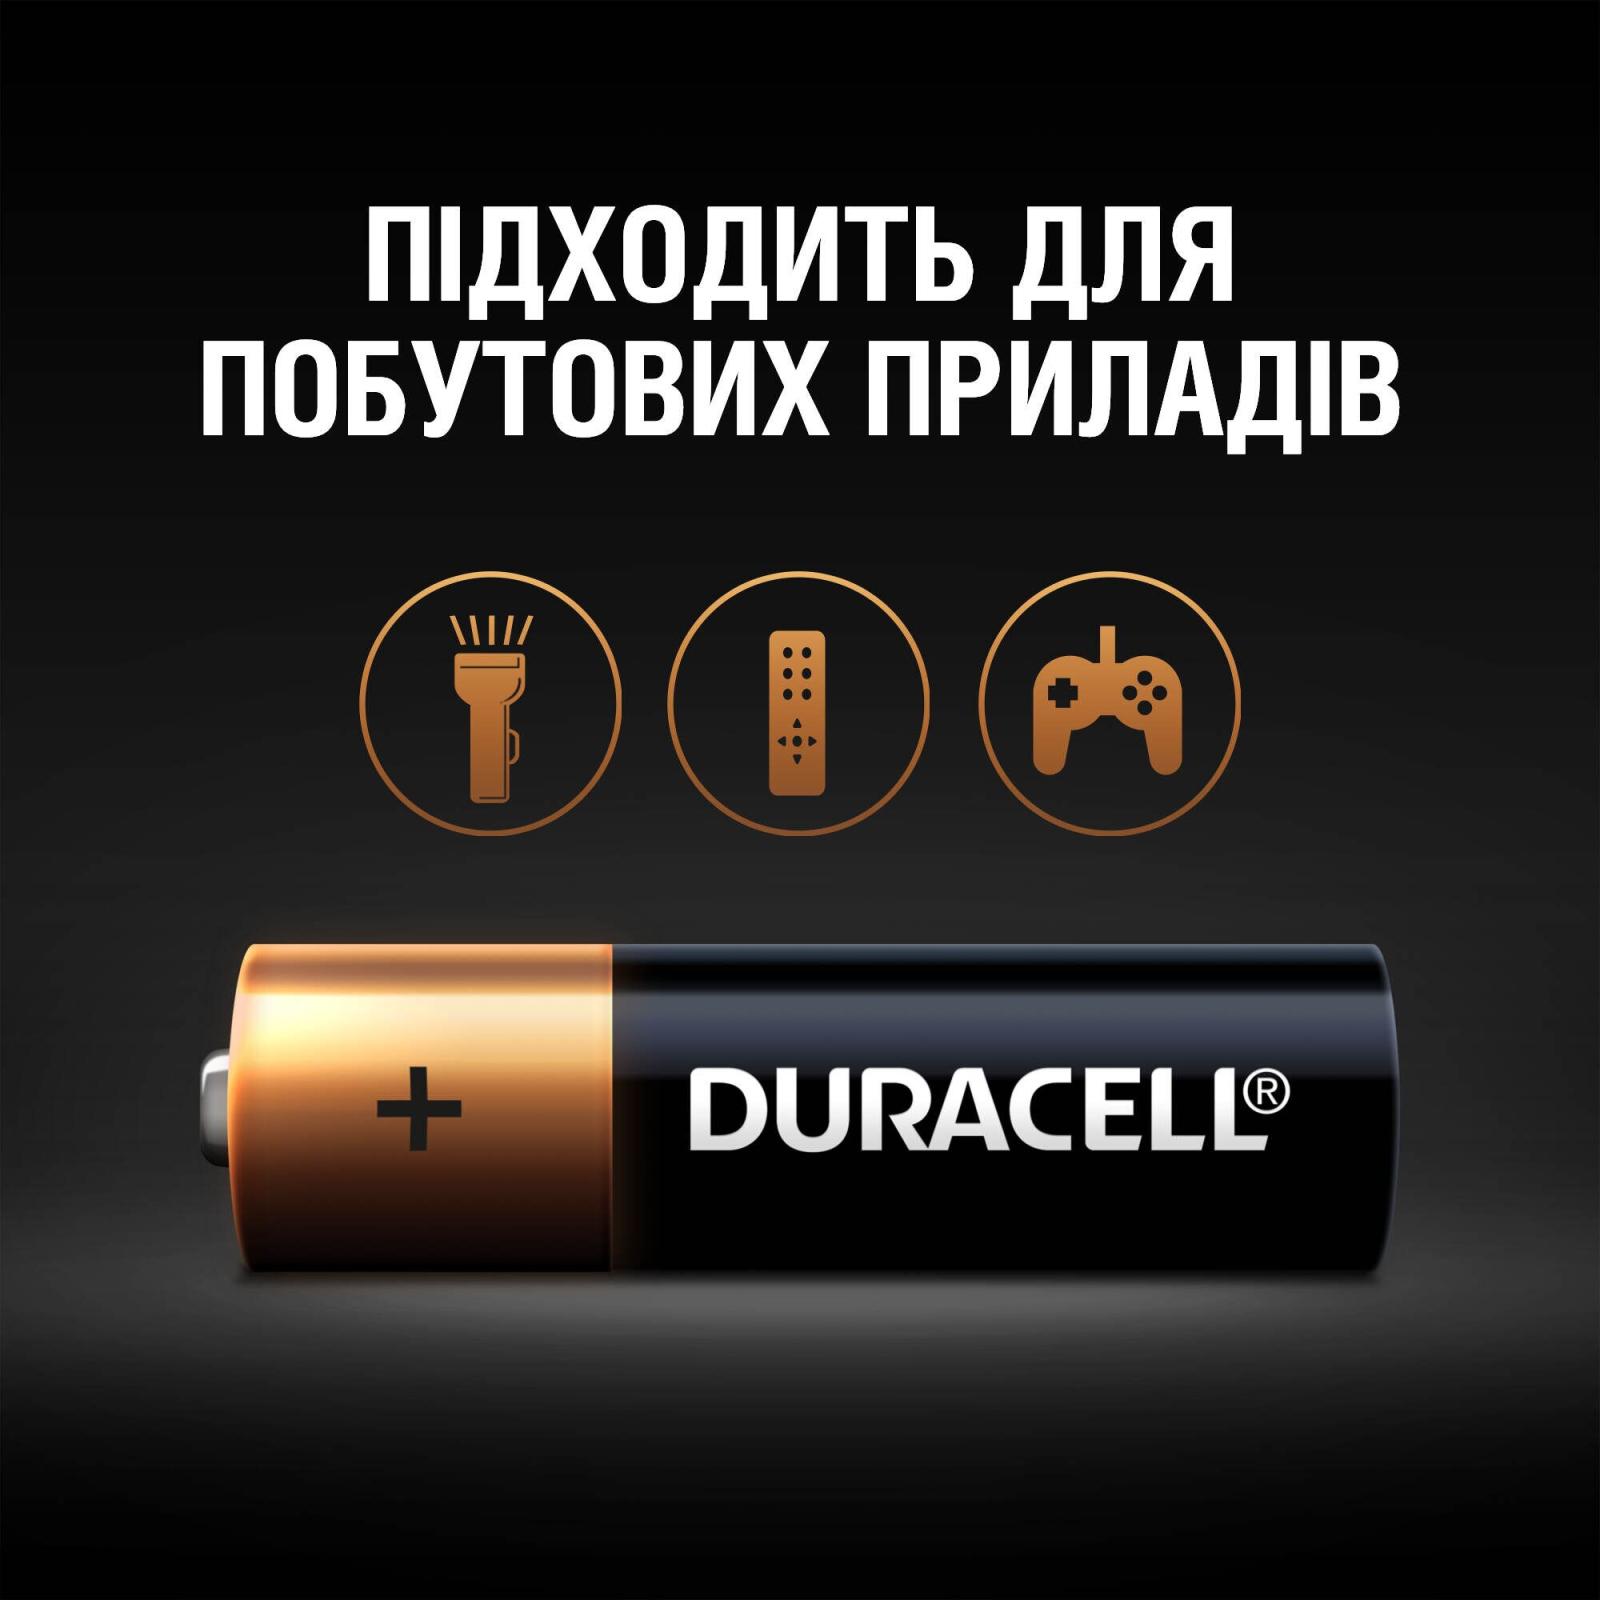 Батарейка Duracell AA MN1500 LR06 * 4 (5000394052536 / 81551270) изображение 5